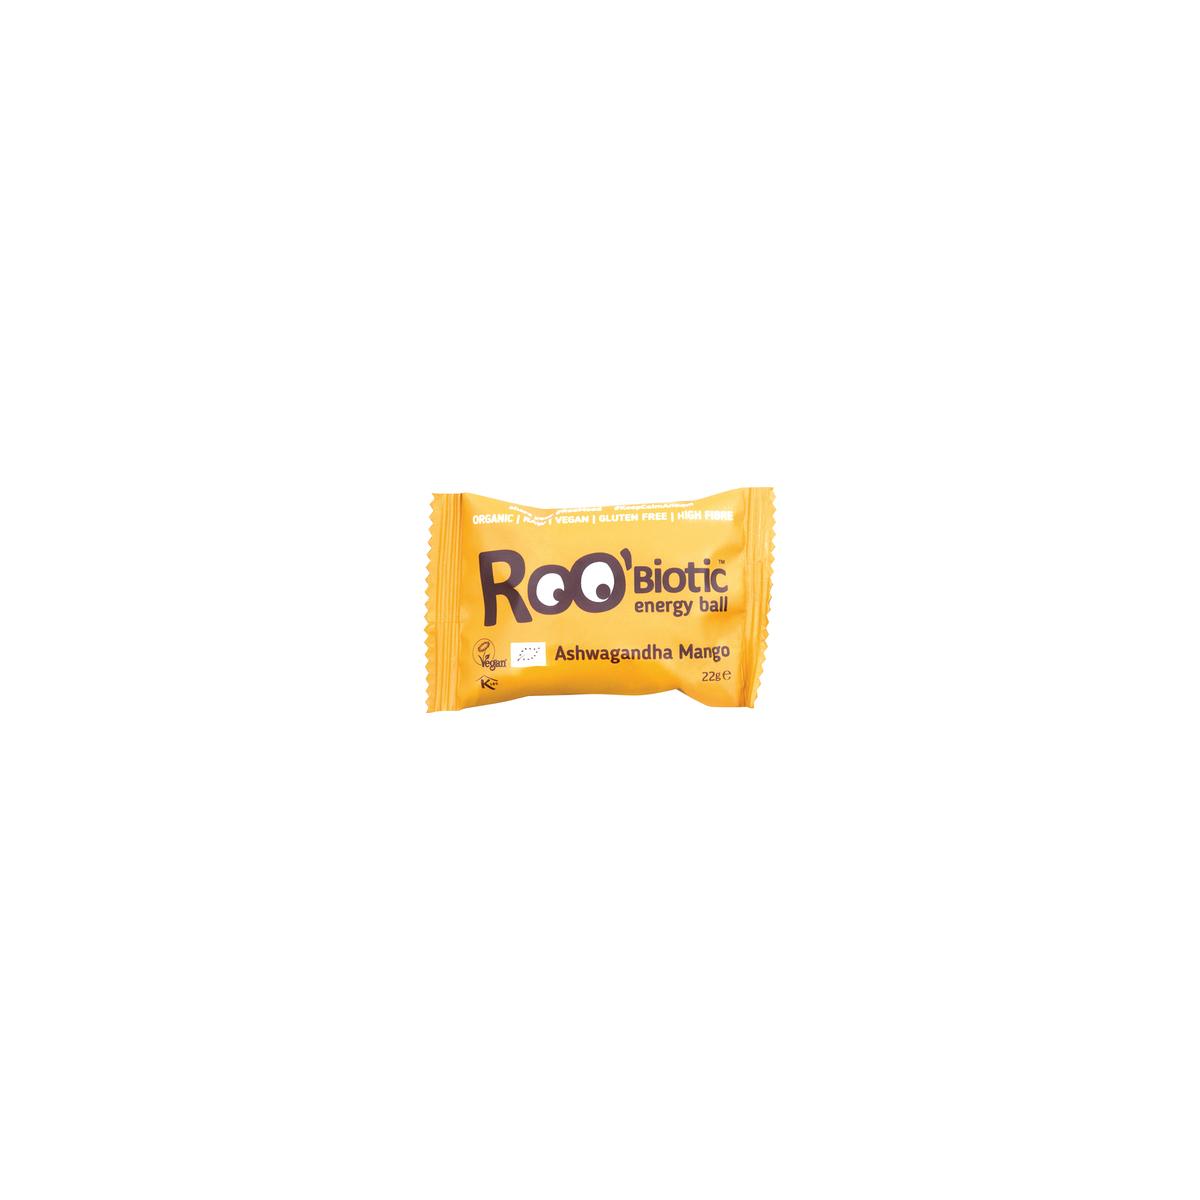 RooBiotic Ashwagandha & Mango Energy Ball Stück 22 g - Roobar